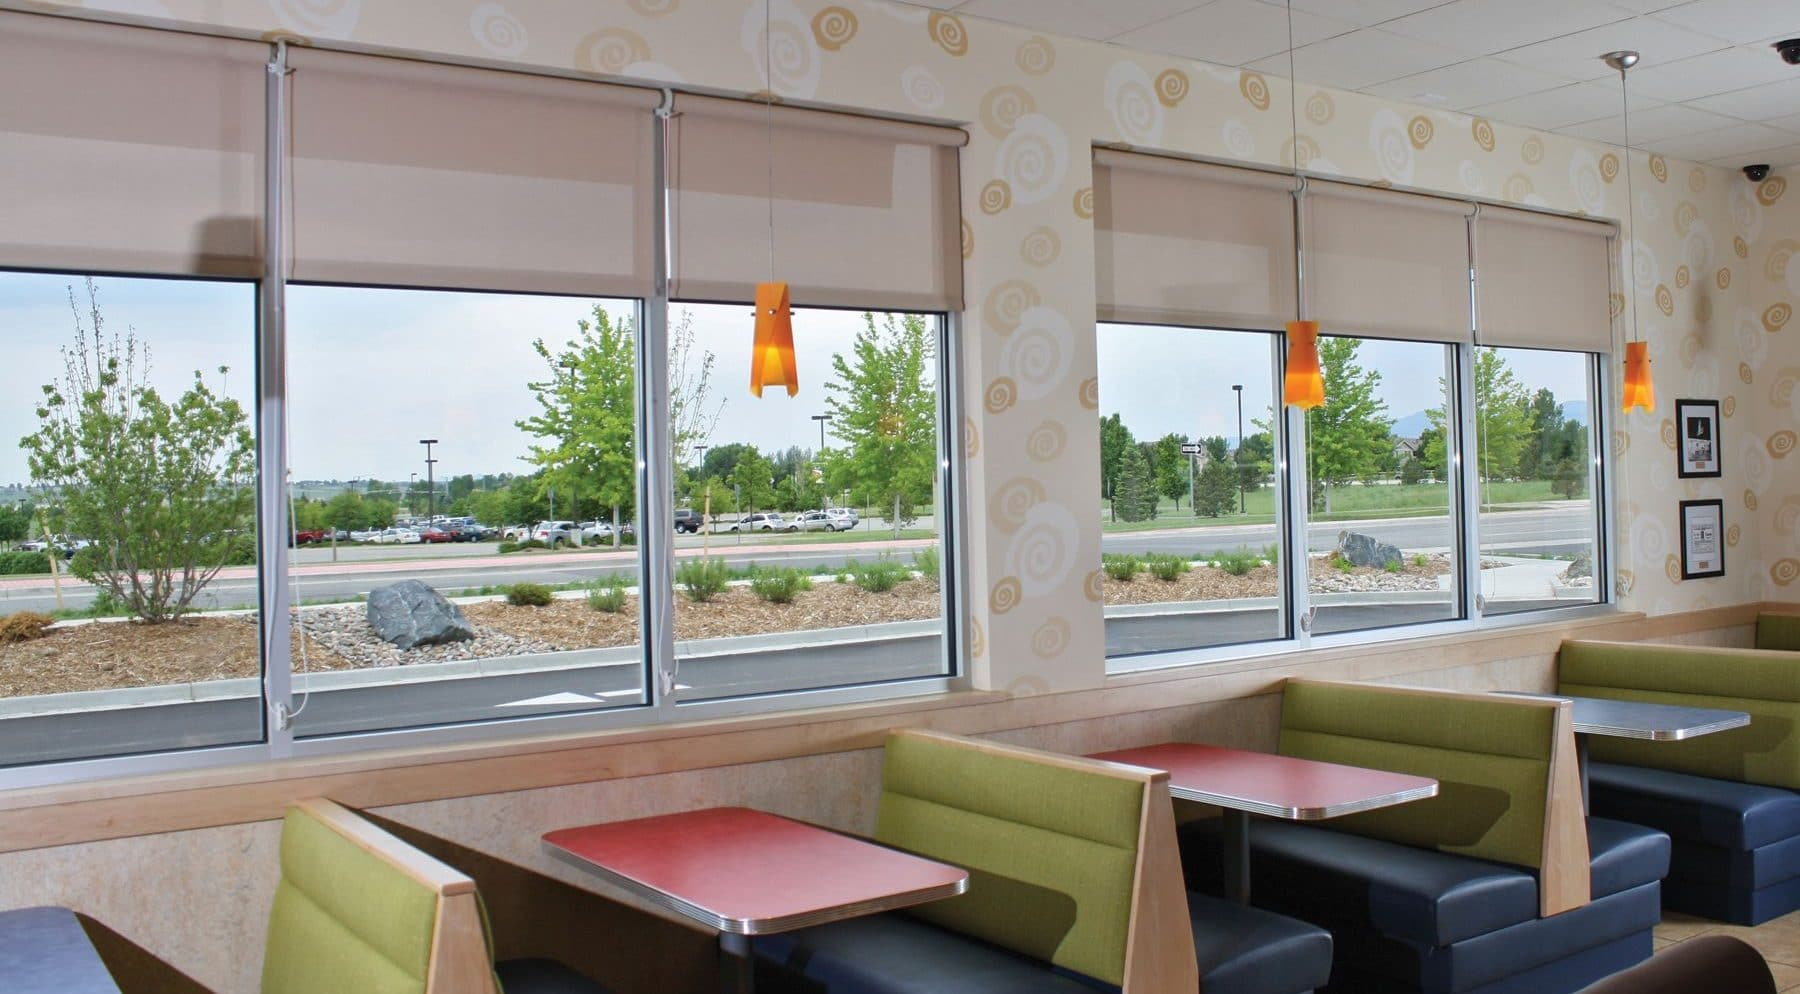 Window Blinds Ideas for Restaurants in Florida